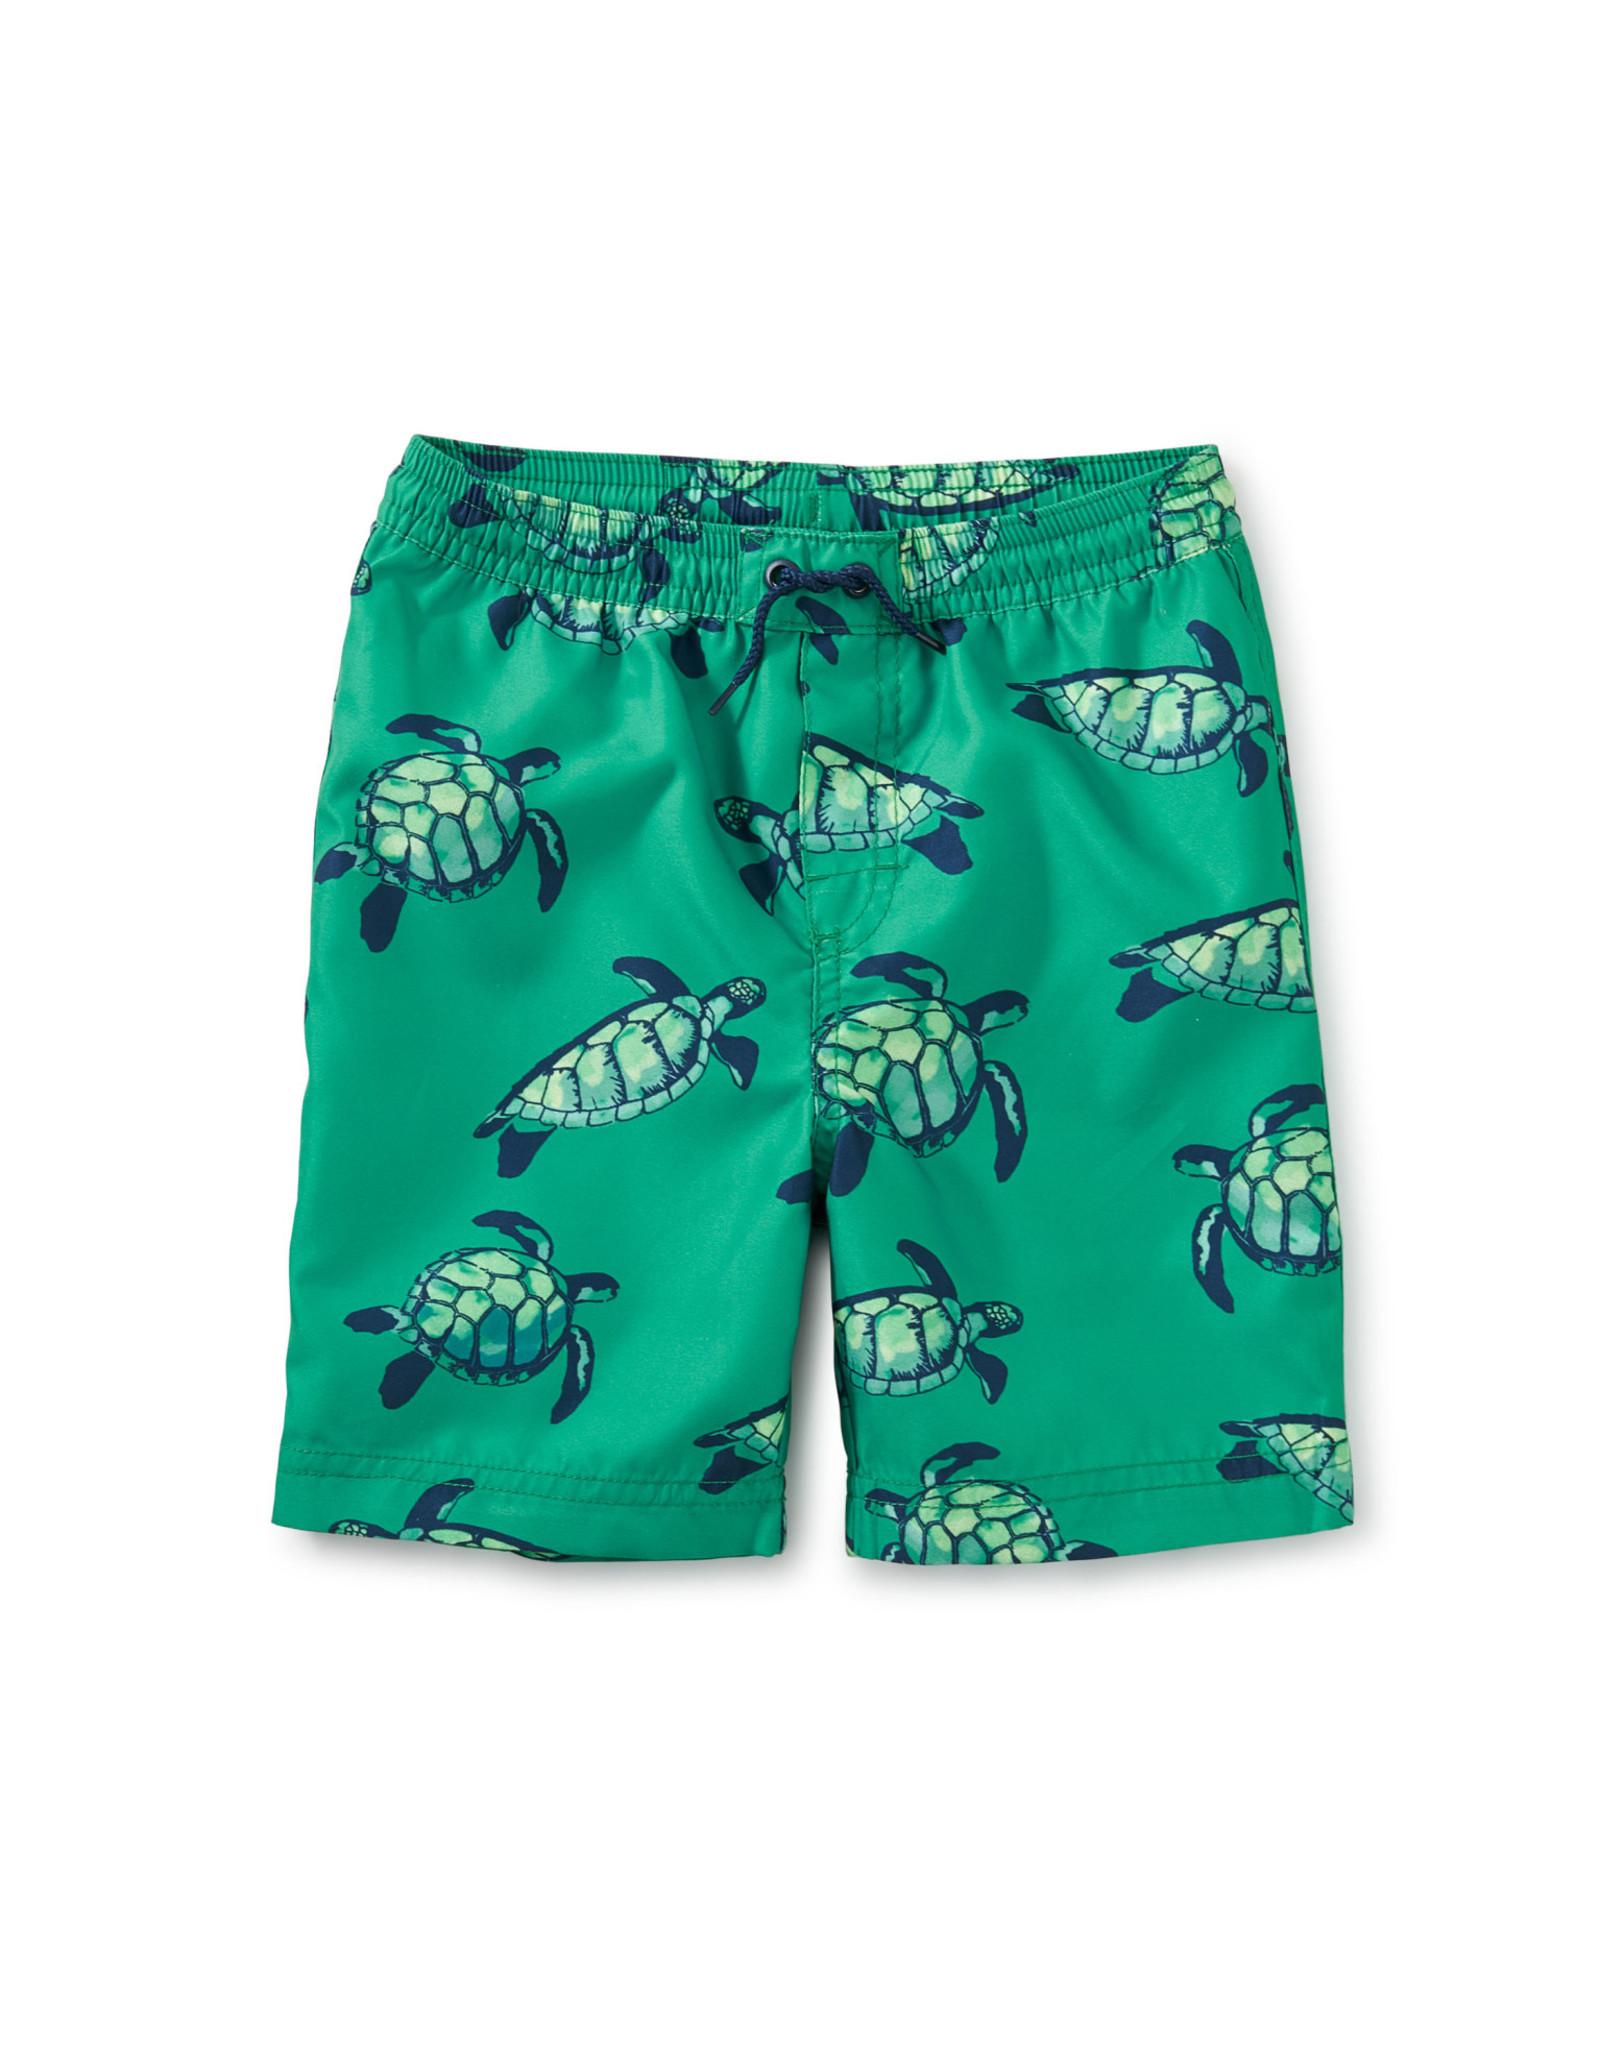 Tea Full Length Swim Trunks, Sea Turtles